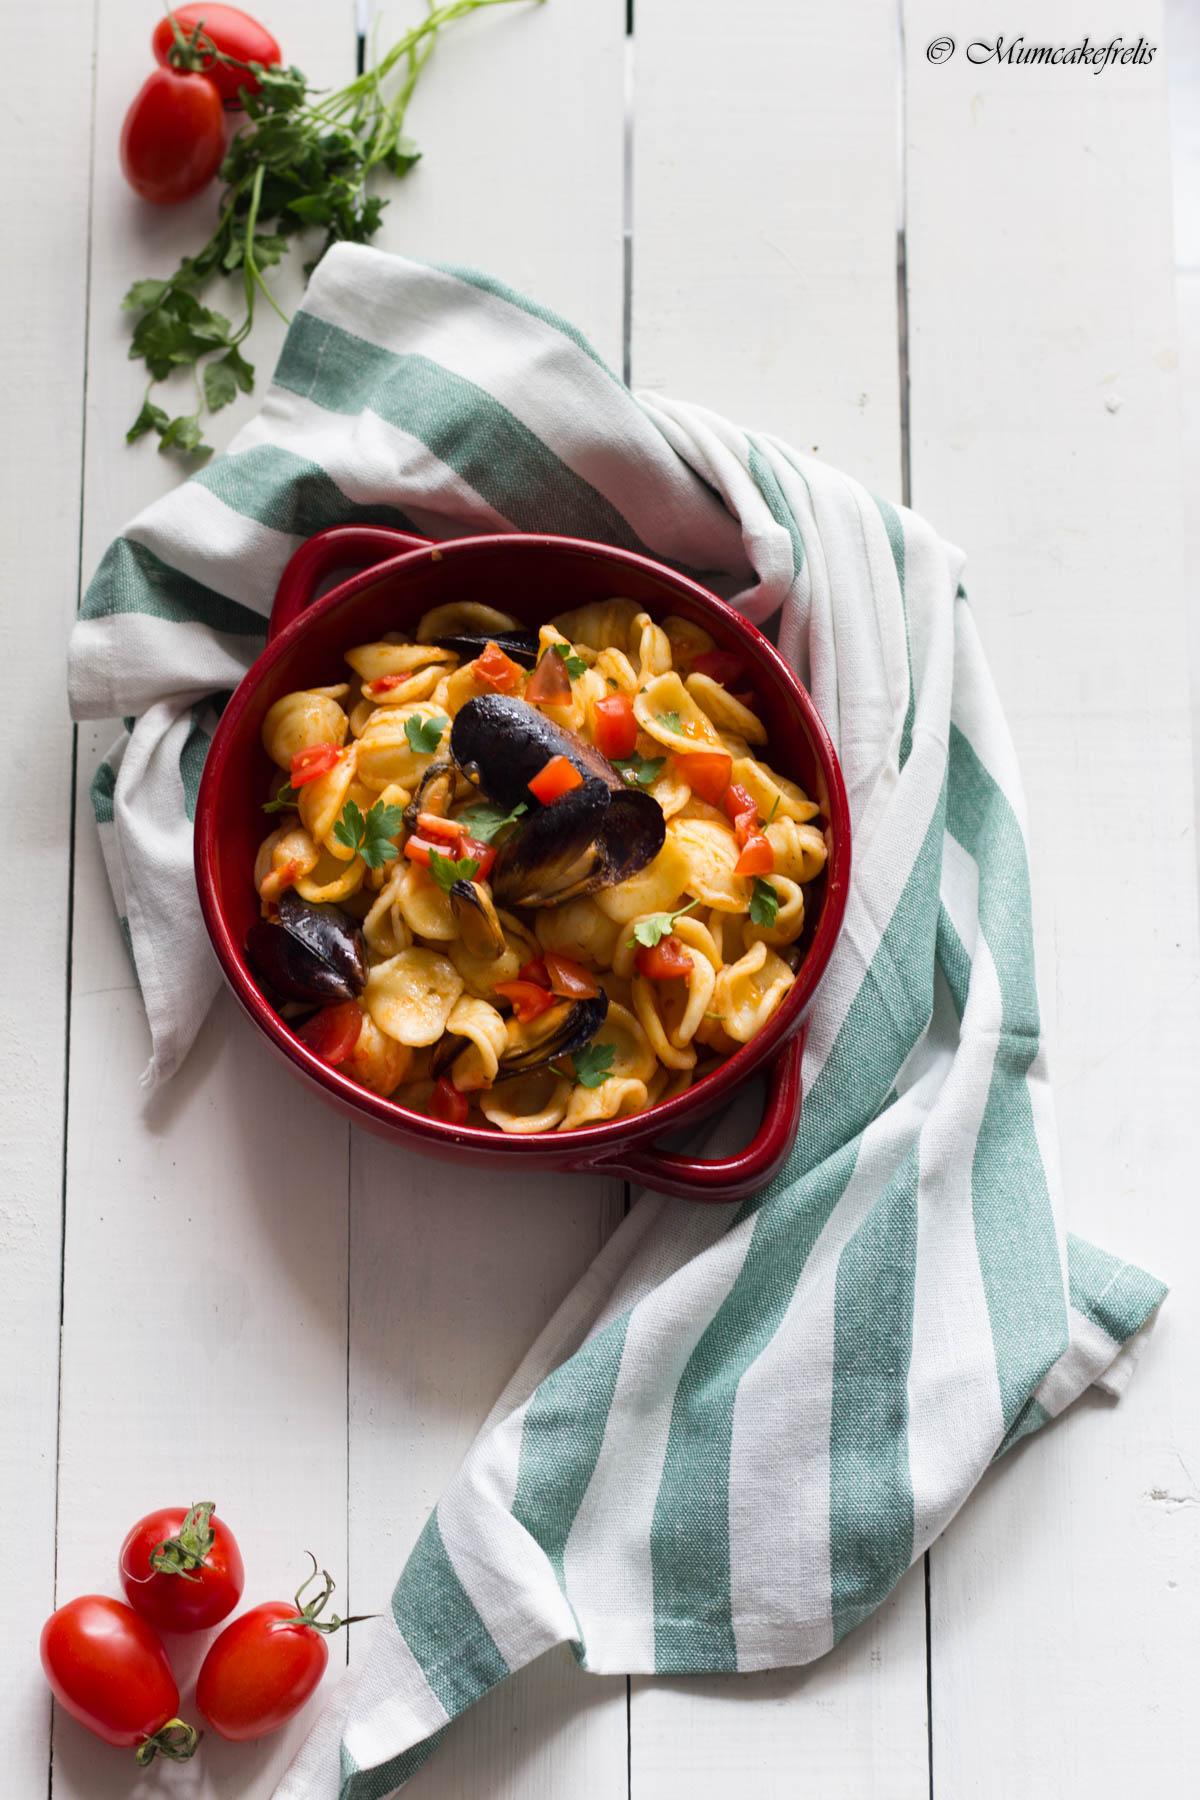 pasta con le cozze, pasta con le cozze surgelate, pasta con le cozze e pomodorini, pasta con cozze e vongole